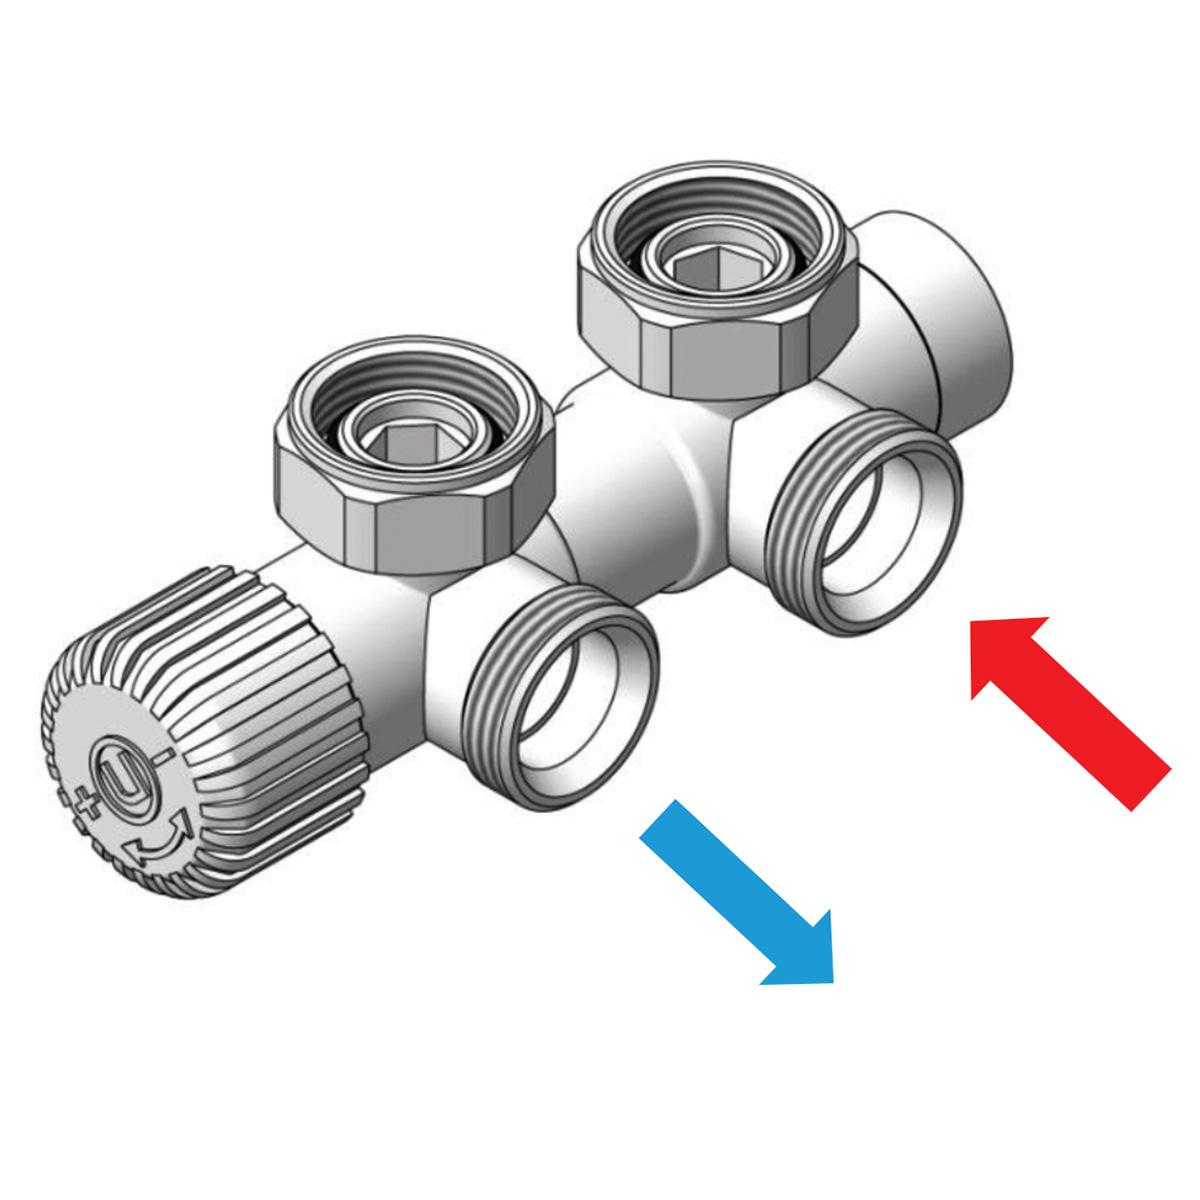 Termostaticky-ventil-twins-prave-pripojeni